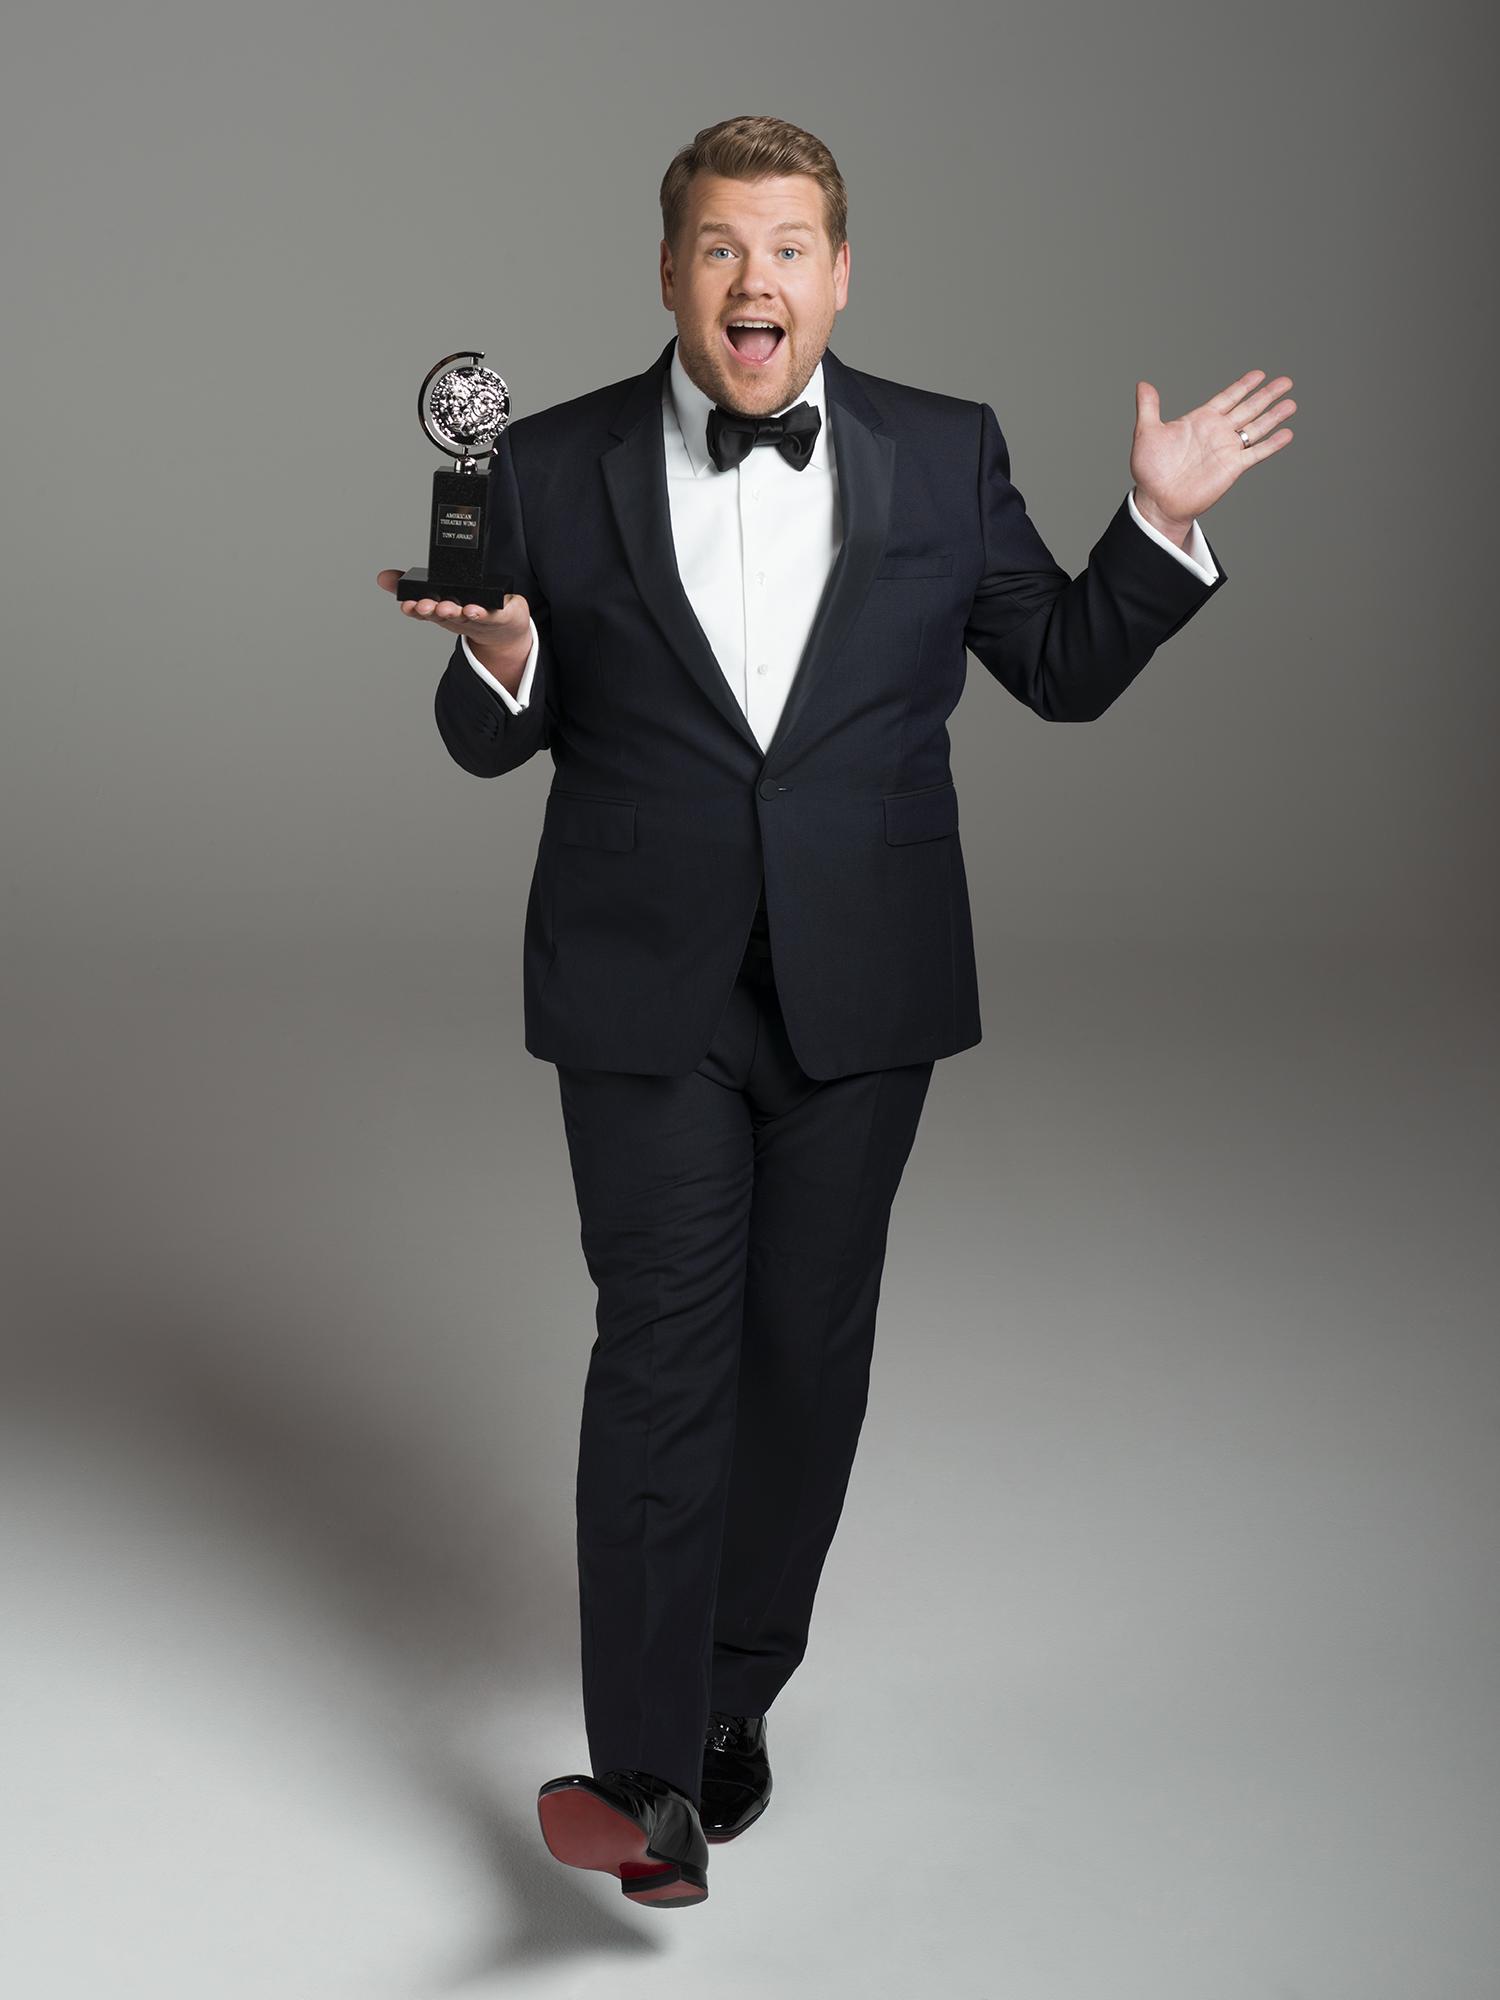 James Corden Will Host 59th Annual Grammy Awards Playbill